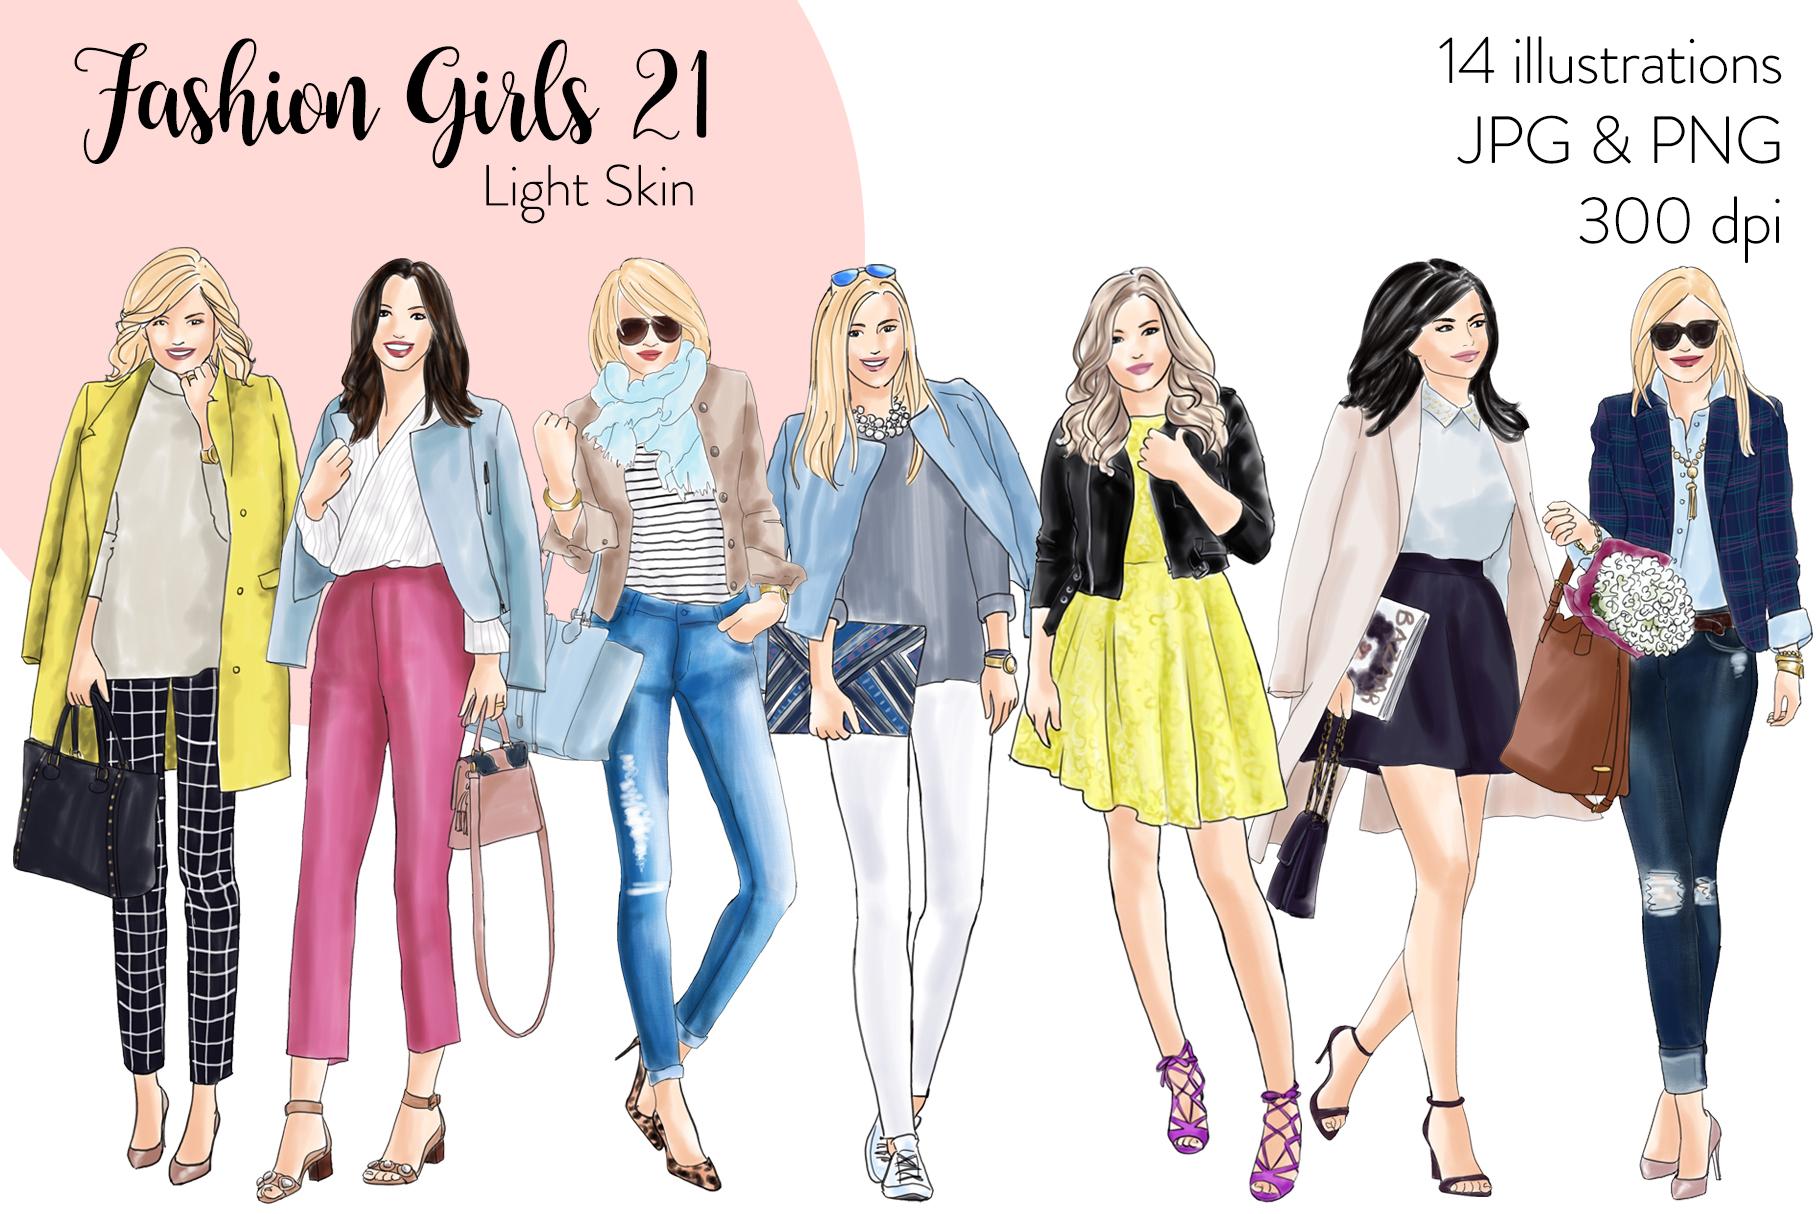 Fashion illustration clipart - Fashion Girls 21 - Light Skin example image 1